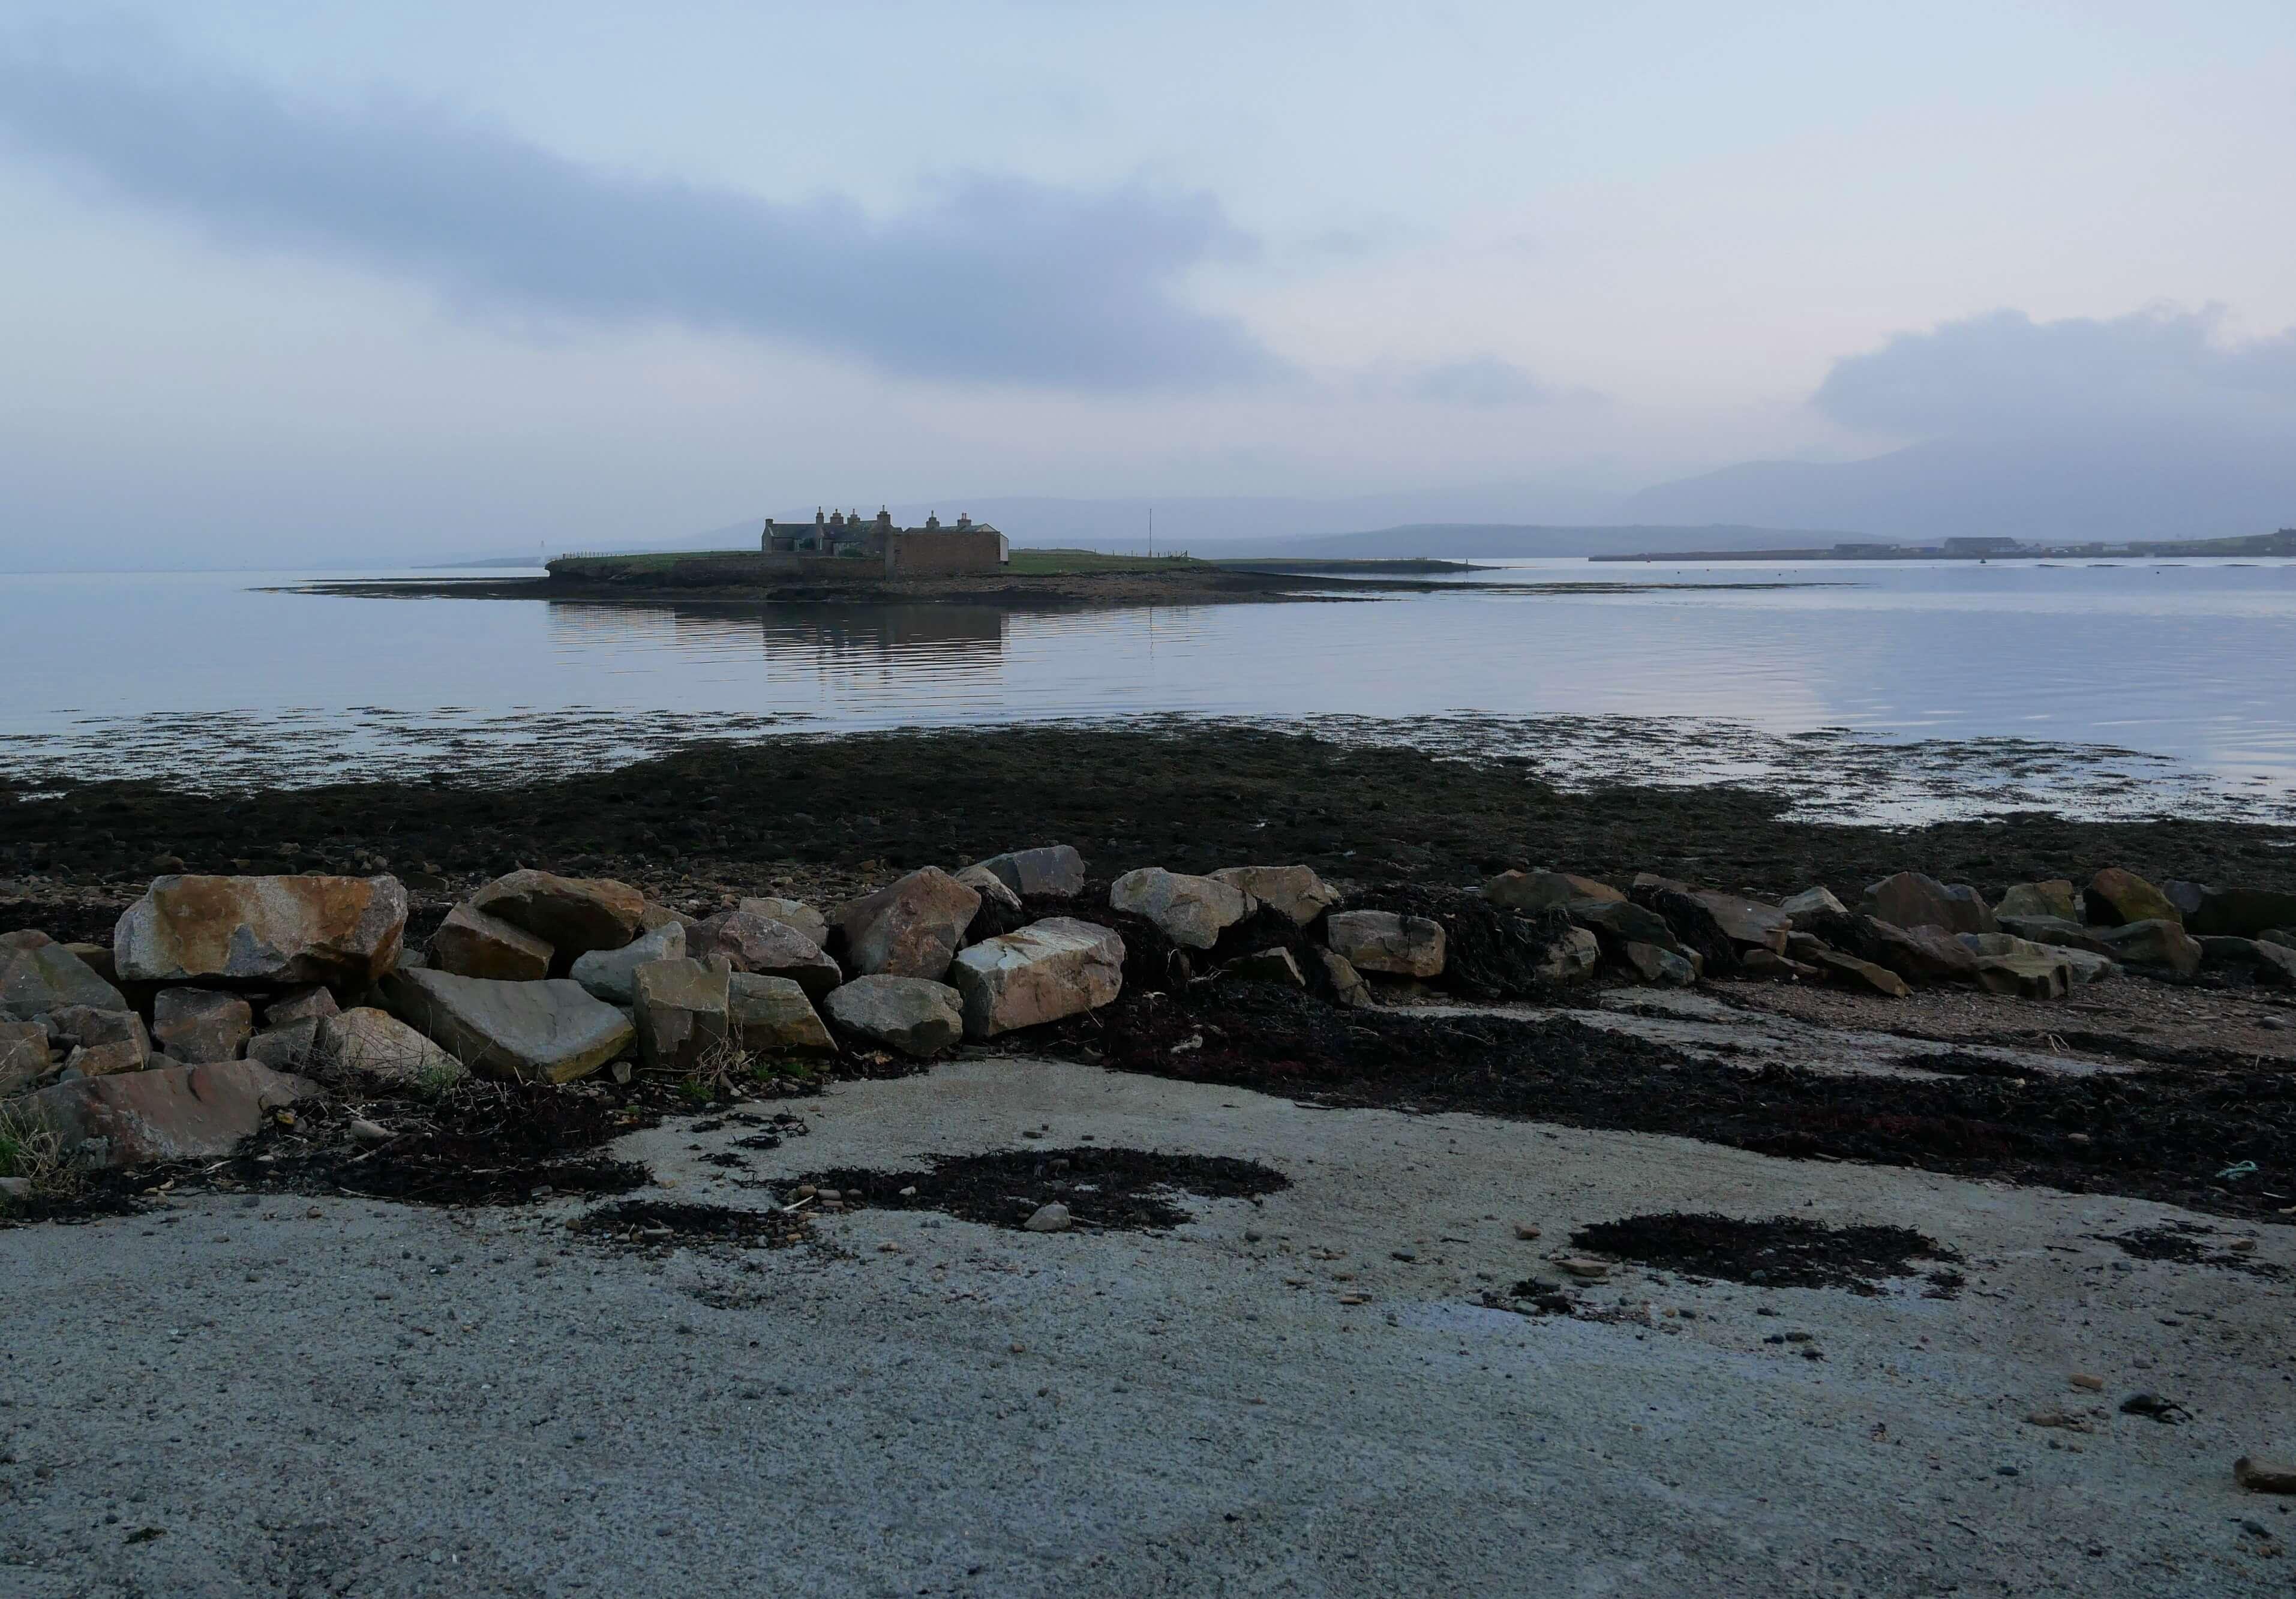 Tidal island: the Inner Holm, Stromness, Orkney Islands, Scotland, UK